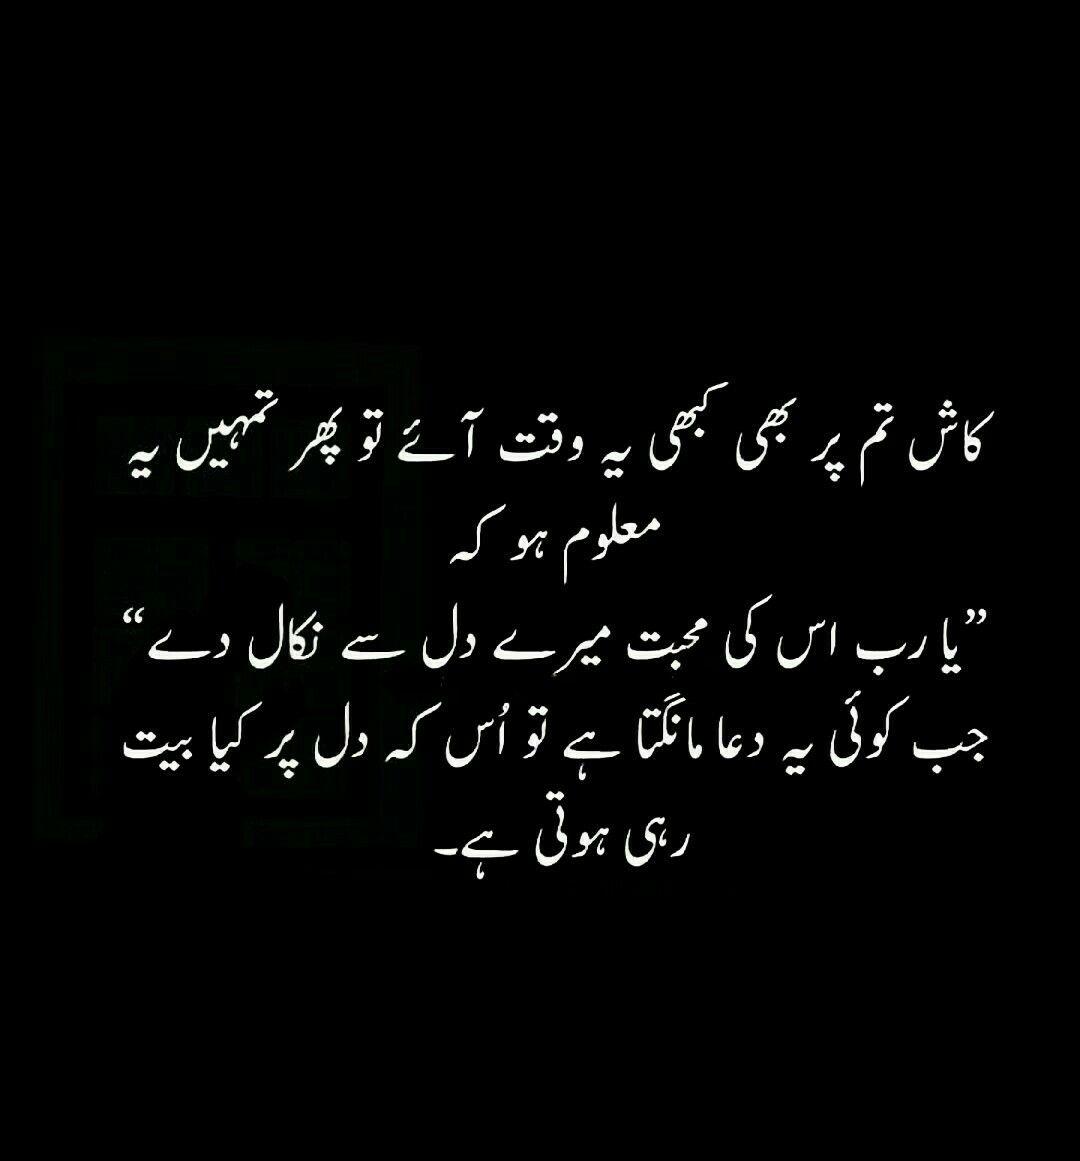 Sad Boy Alone Quotes: Urdu Quotes, Urdu Poetry, Poetry